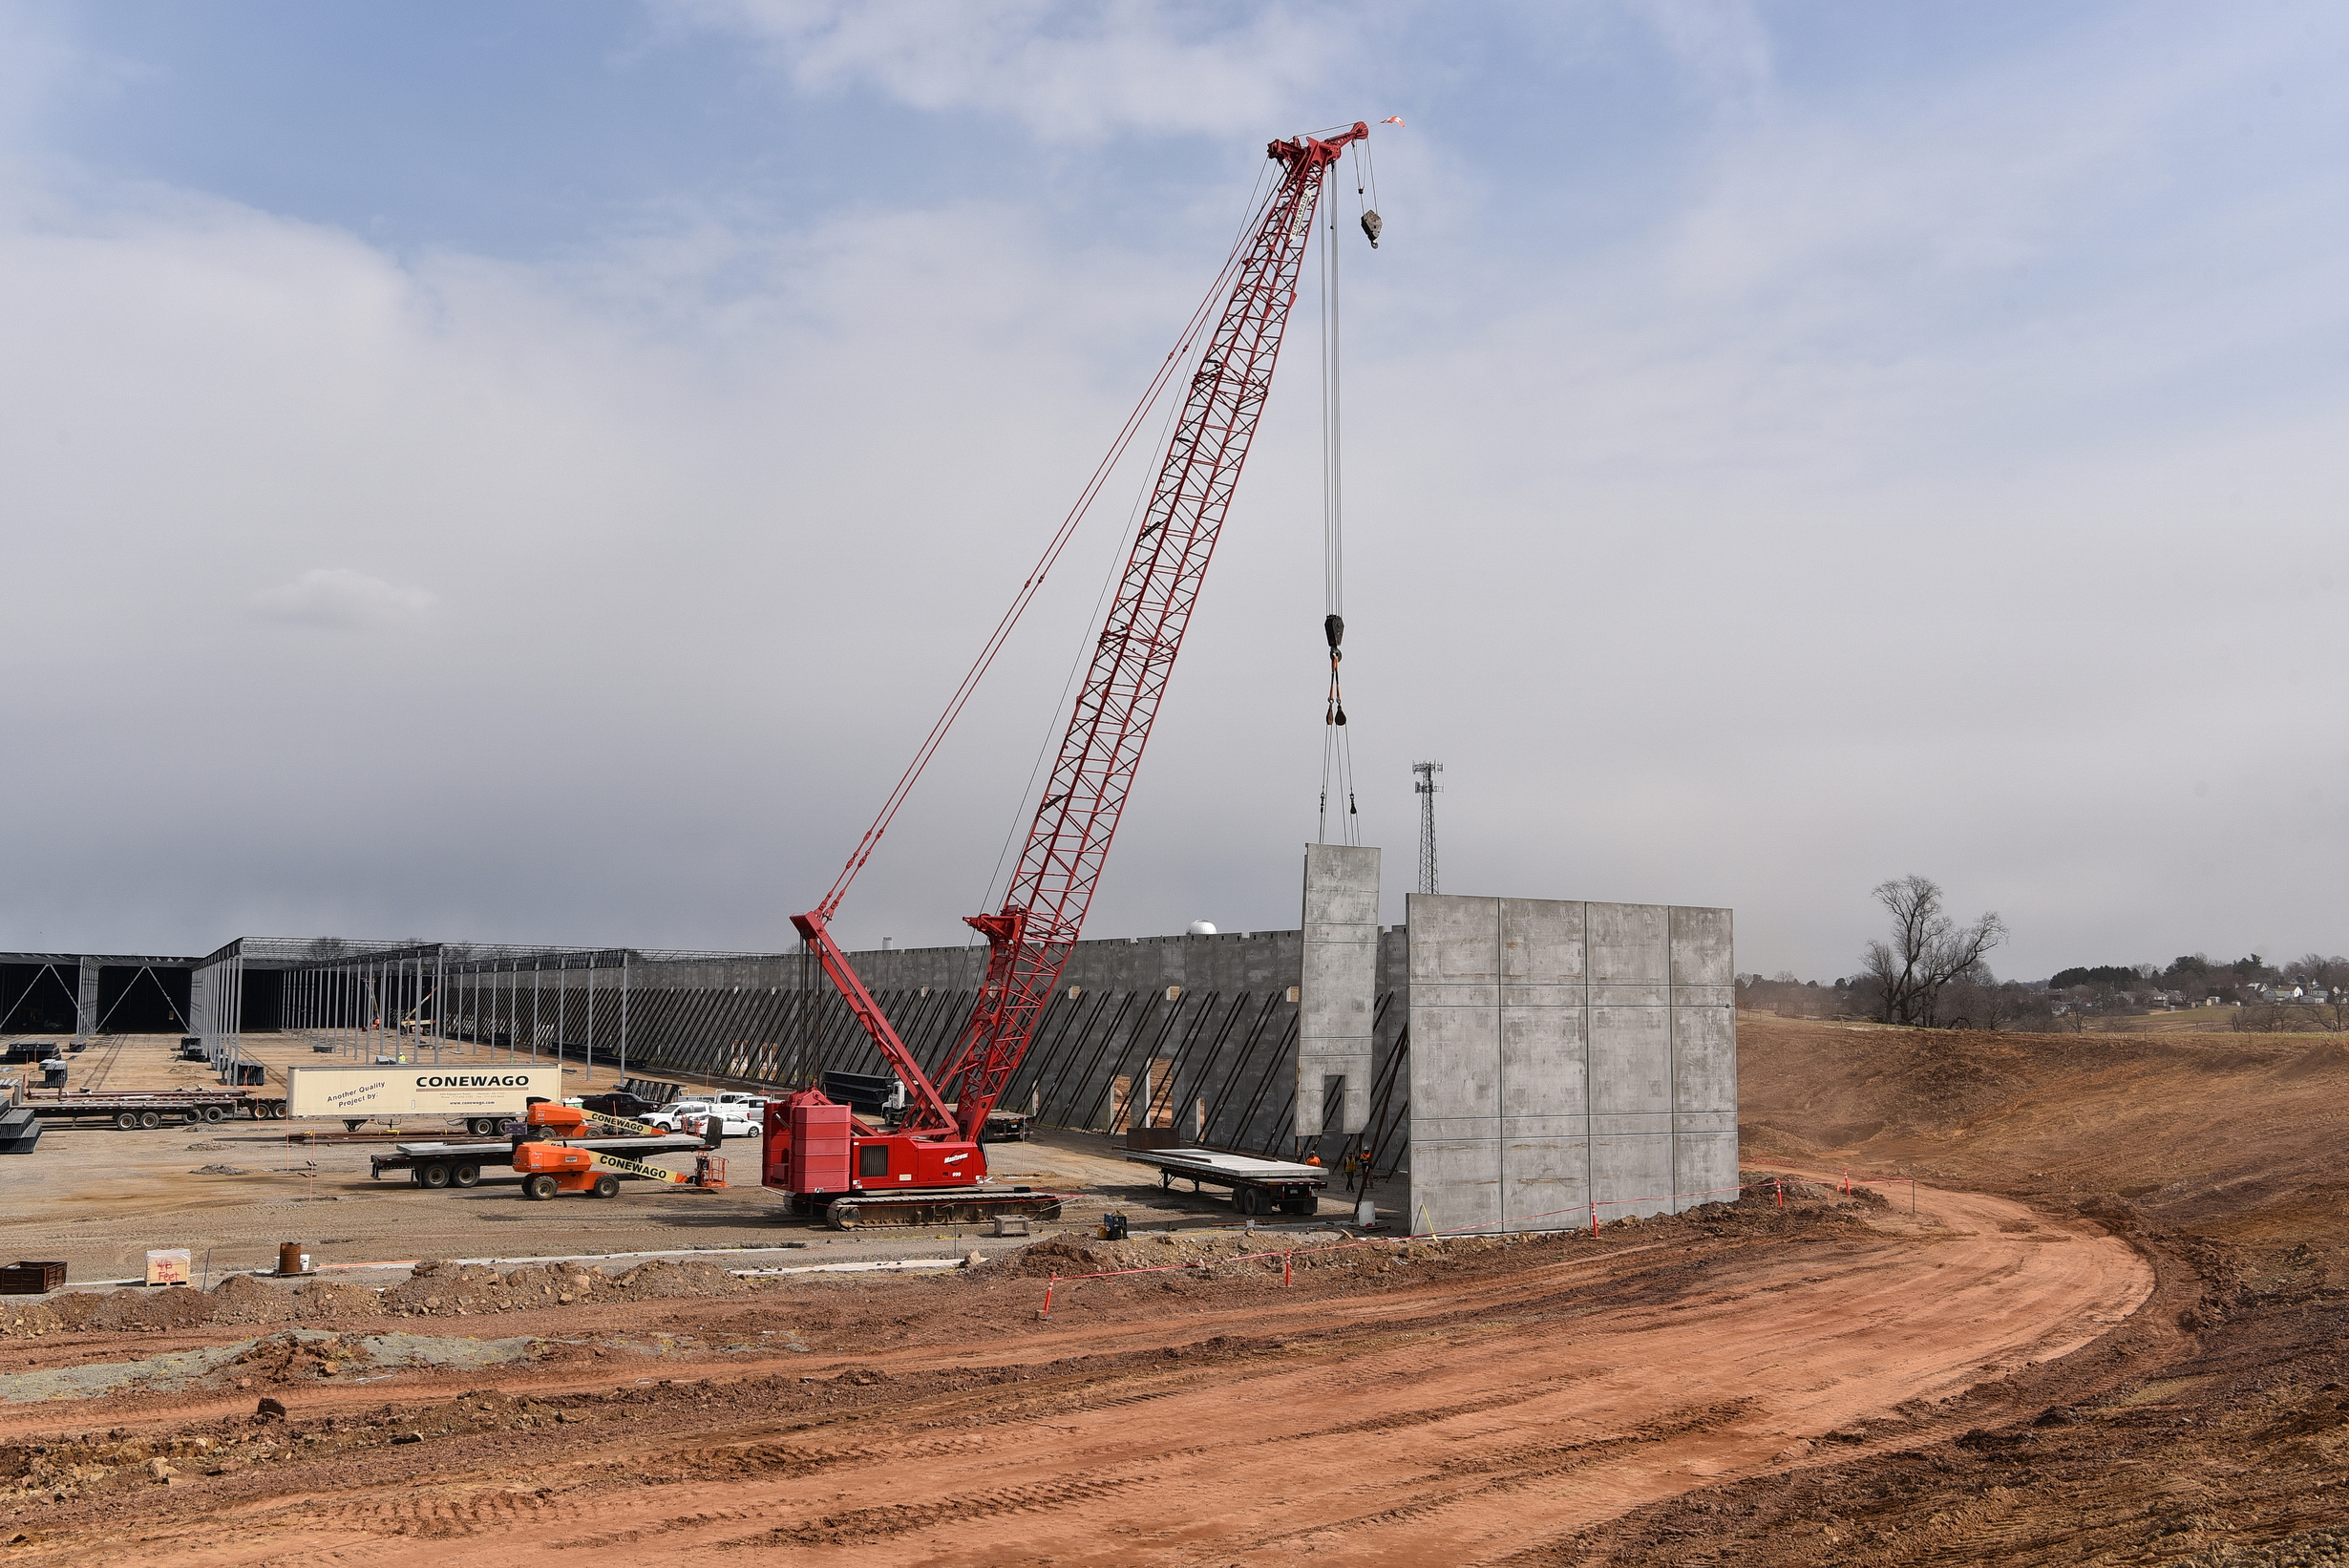 Conewago Manufacturing Steel & Precast Erector Project - Arco - DHL - 84 Zion's View